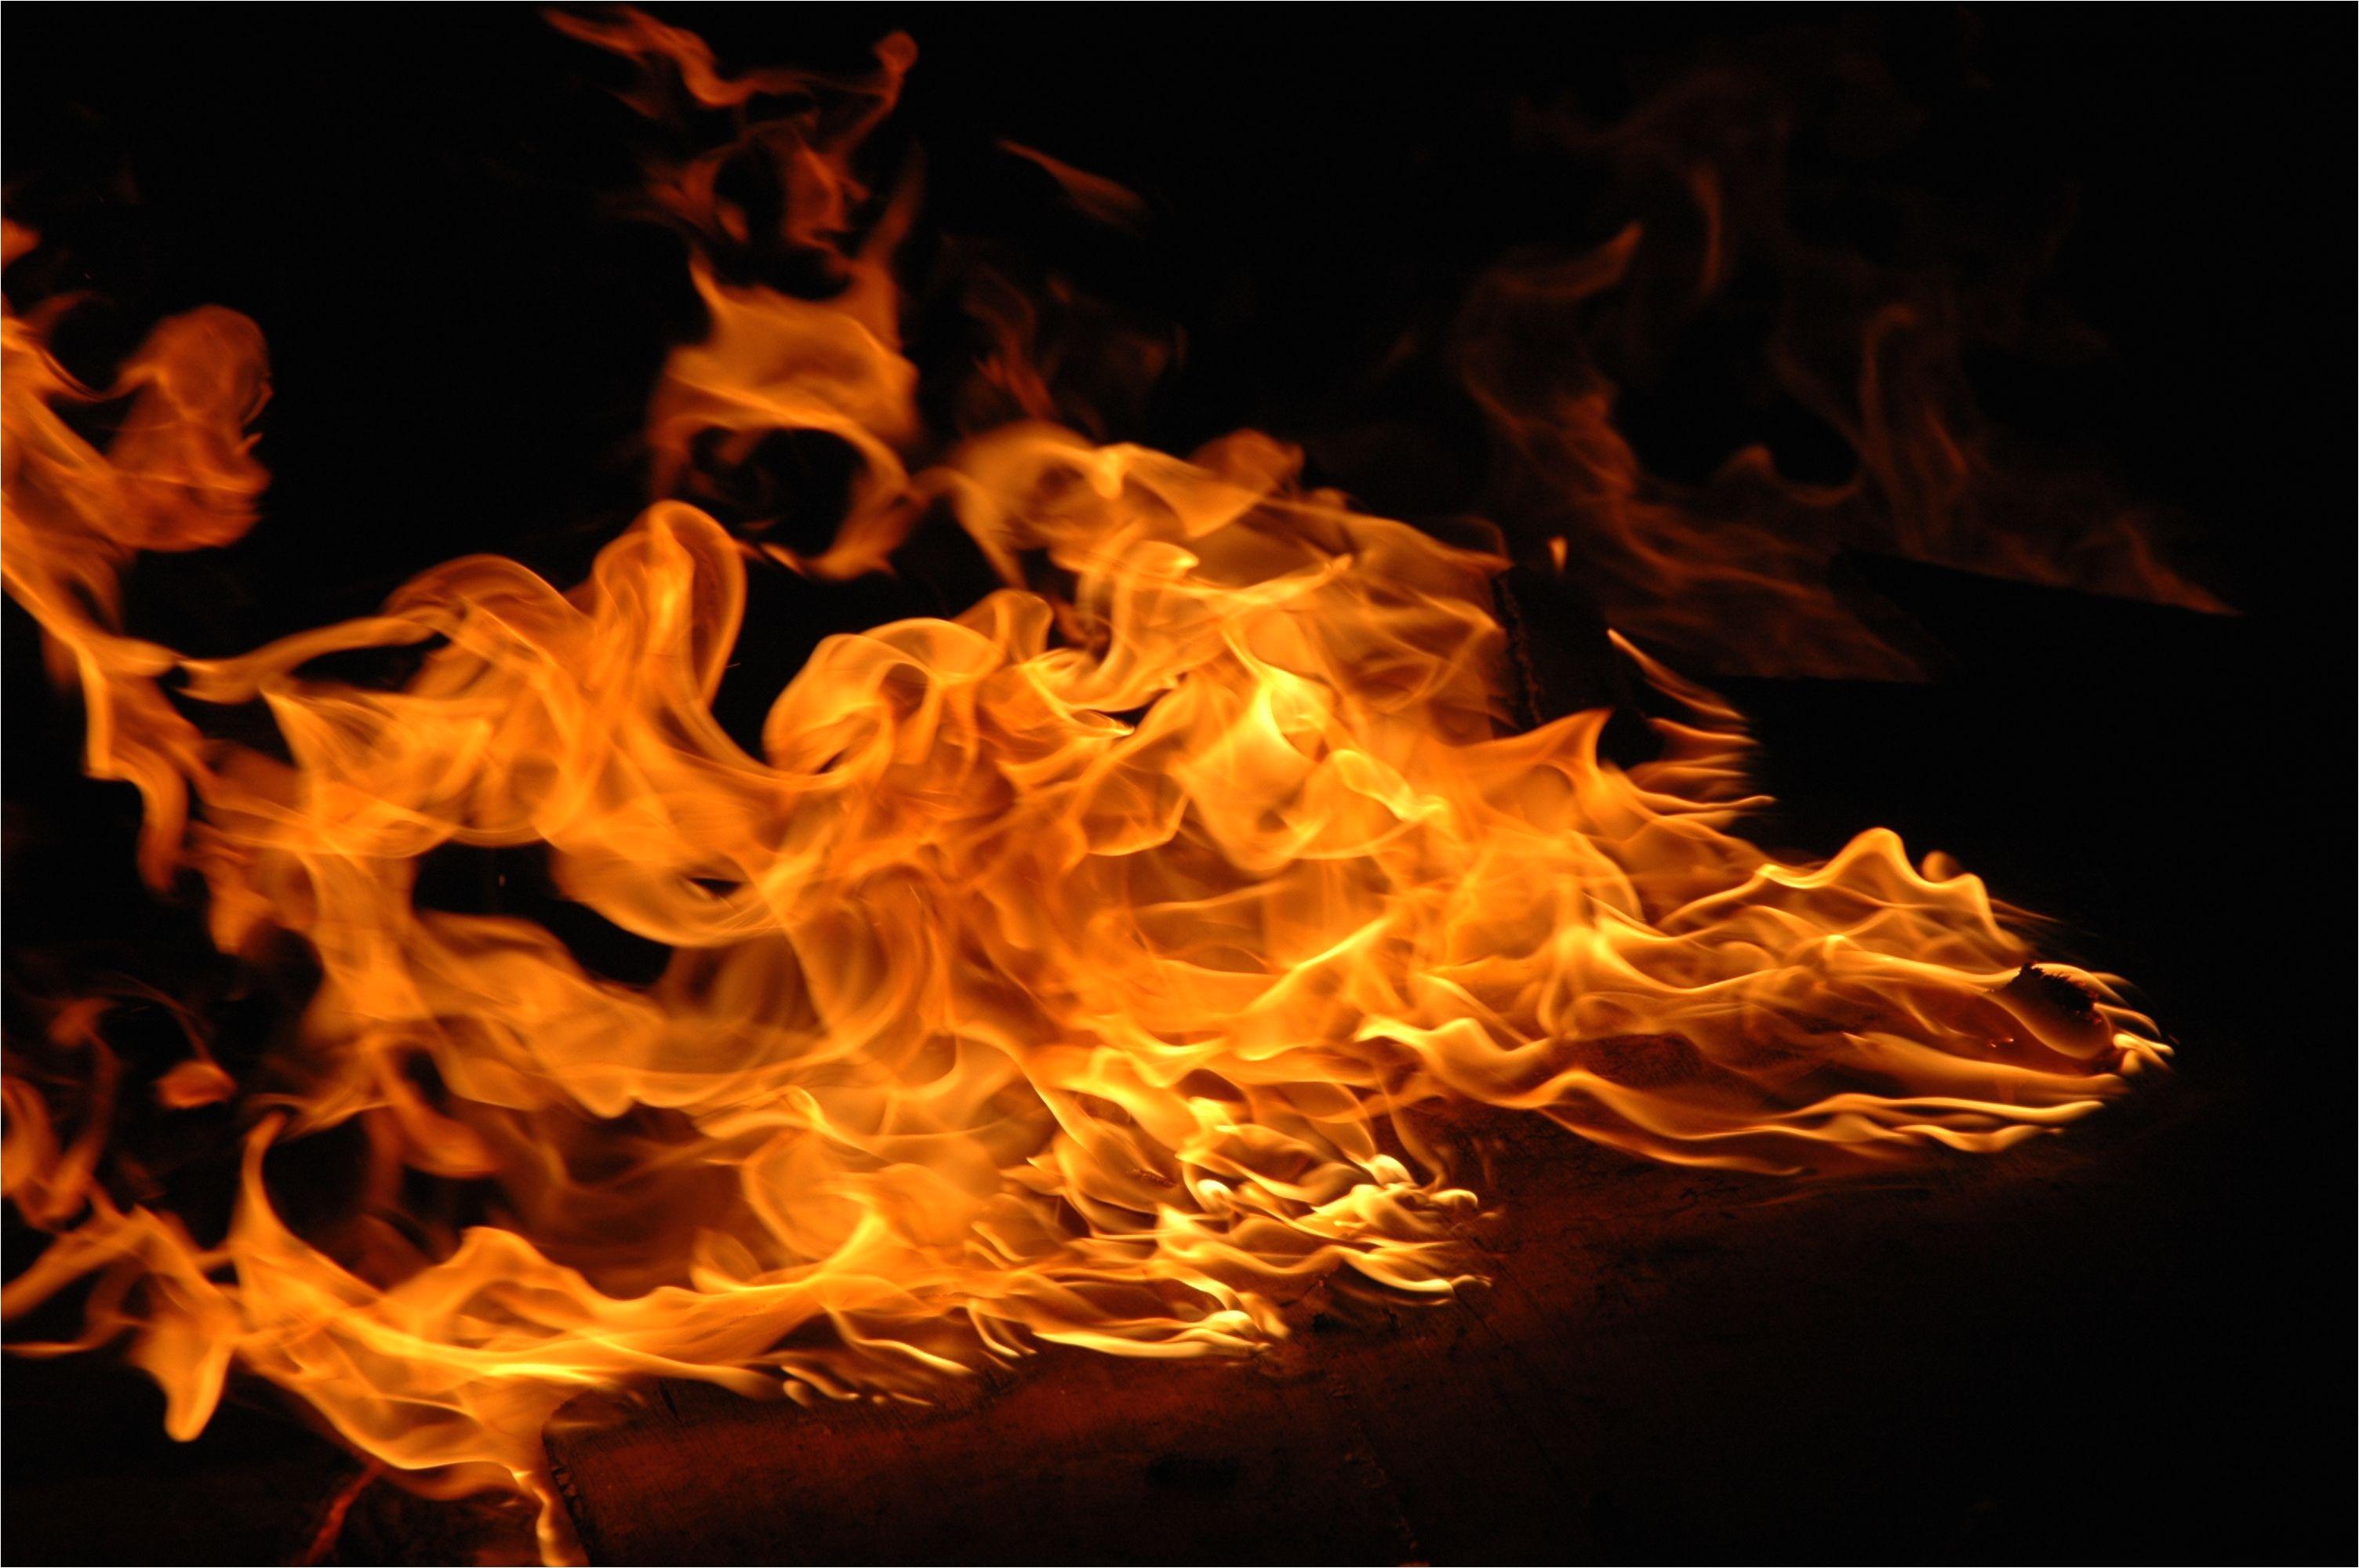 close up of flame 536940503 59b2b3de845b3400107a7f27 jpg